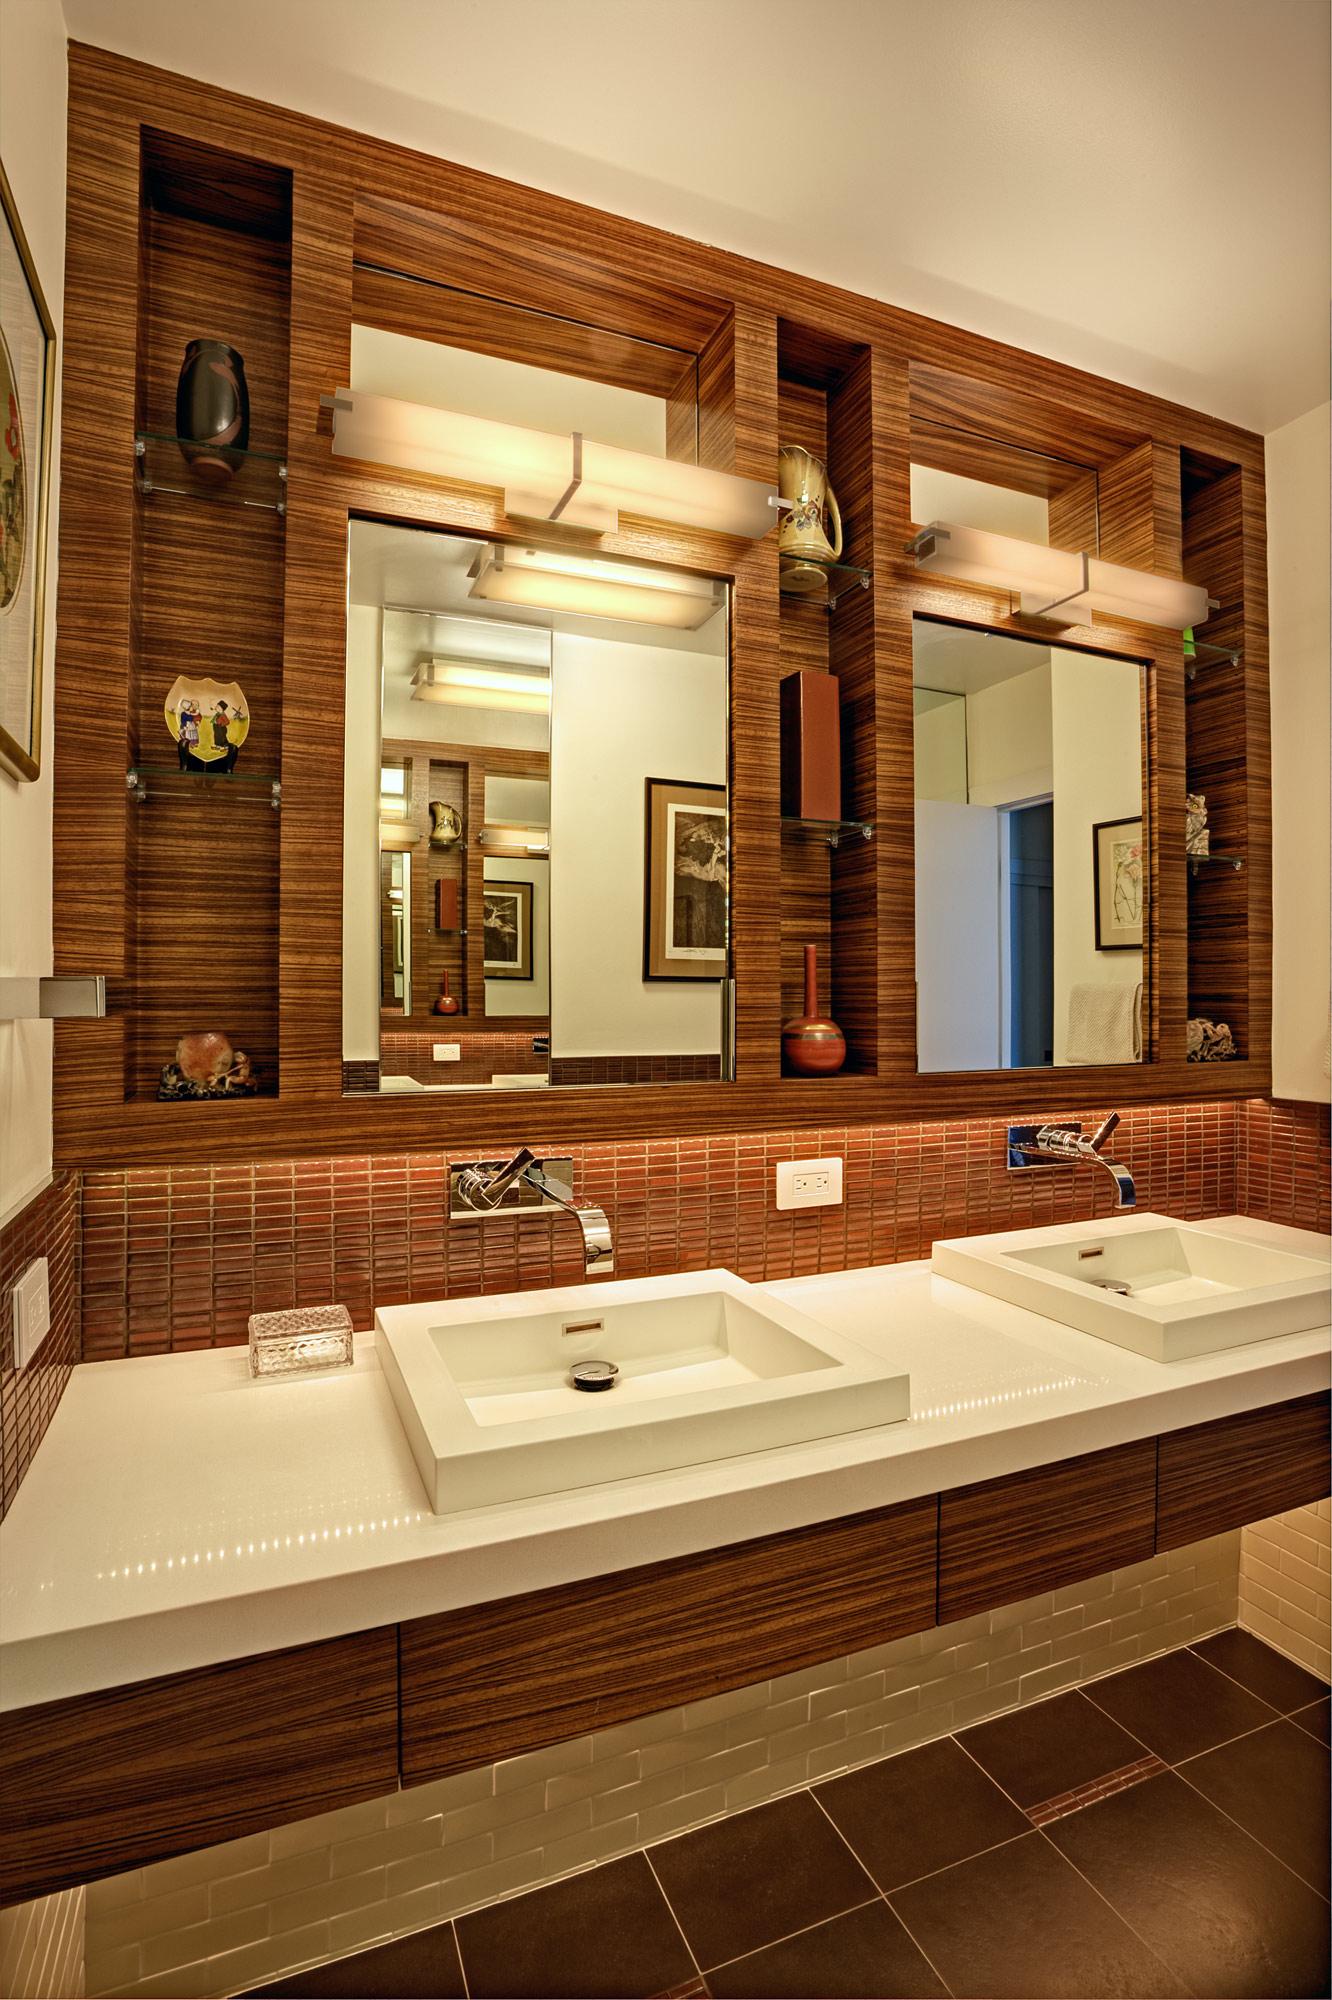 Kaplan-Architects-high-rise-interior-master-bathroom-vanity.jpg